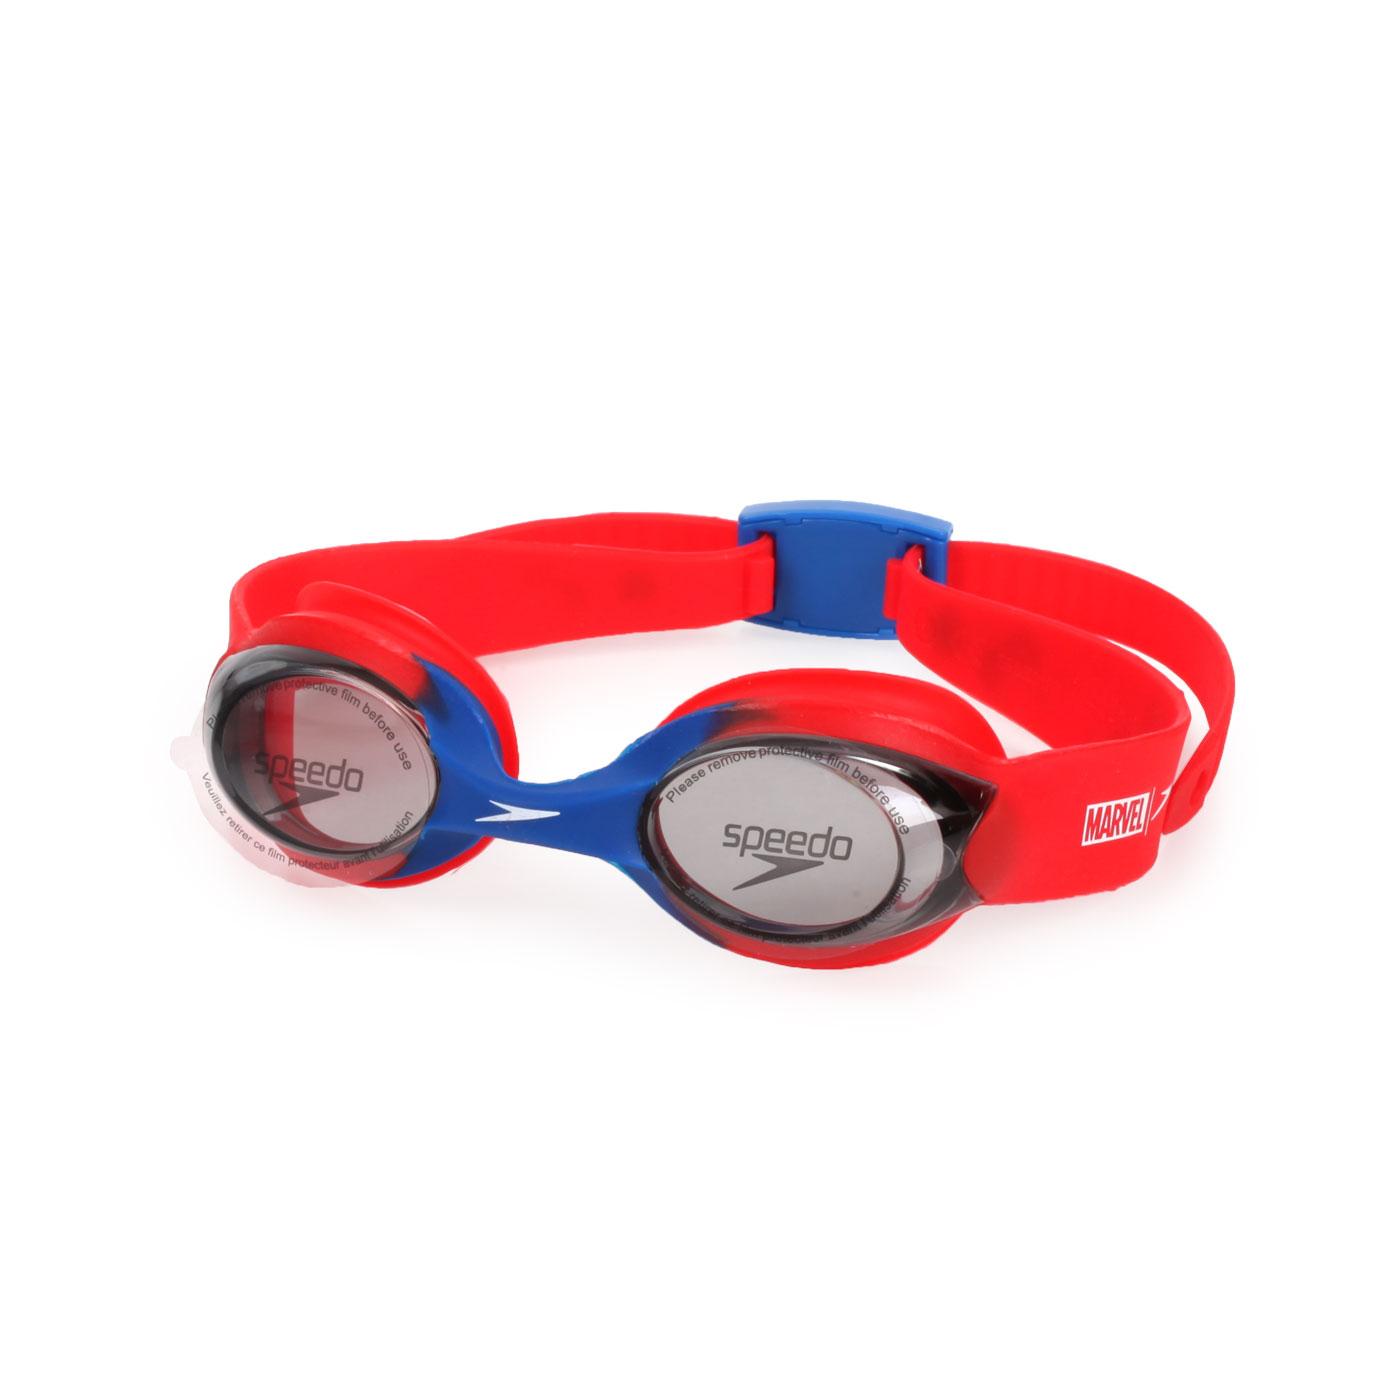 SPEEDO 幼童運動泳鏡-蜘蛛人 SD812115F278 - 紅藍白